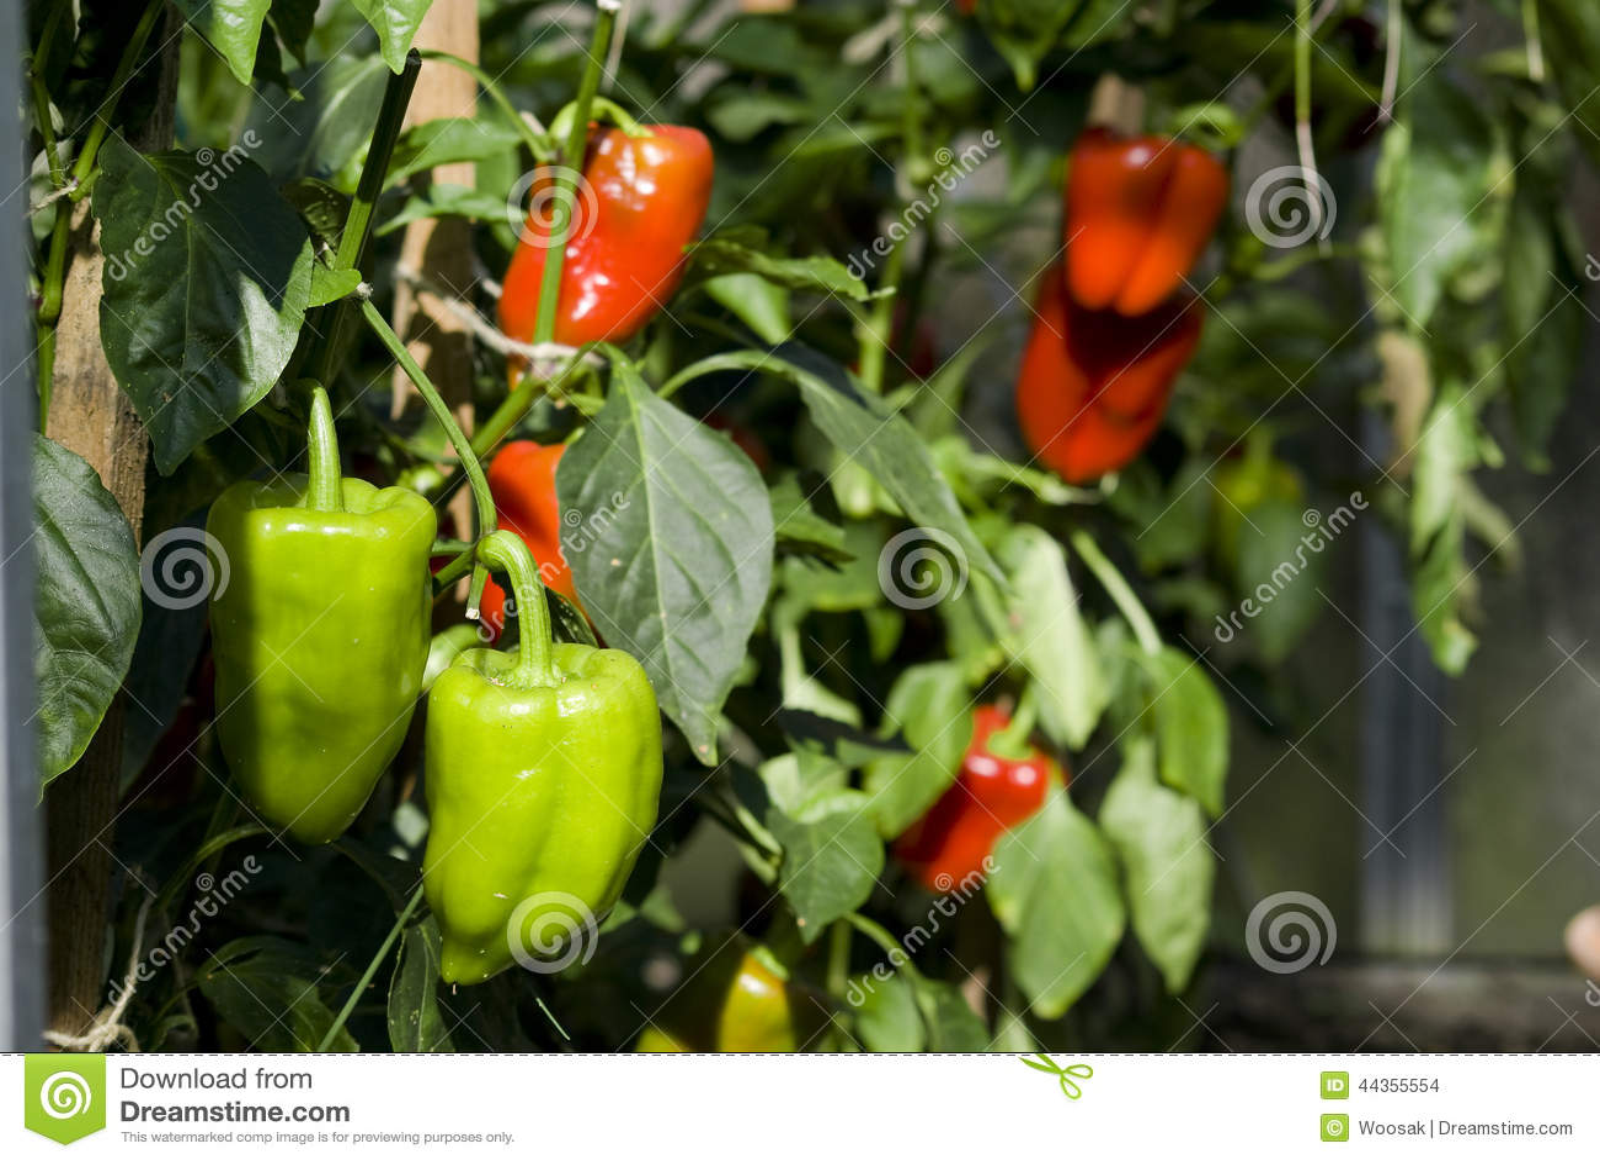 Verde e peperone